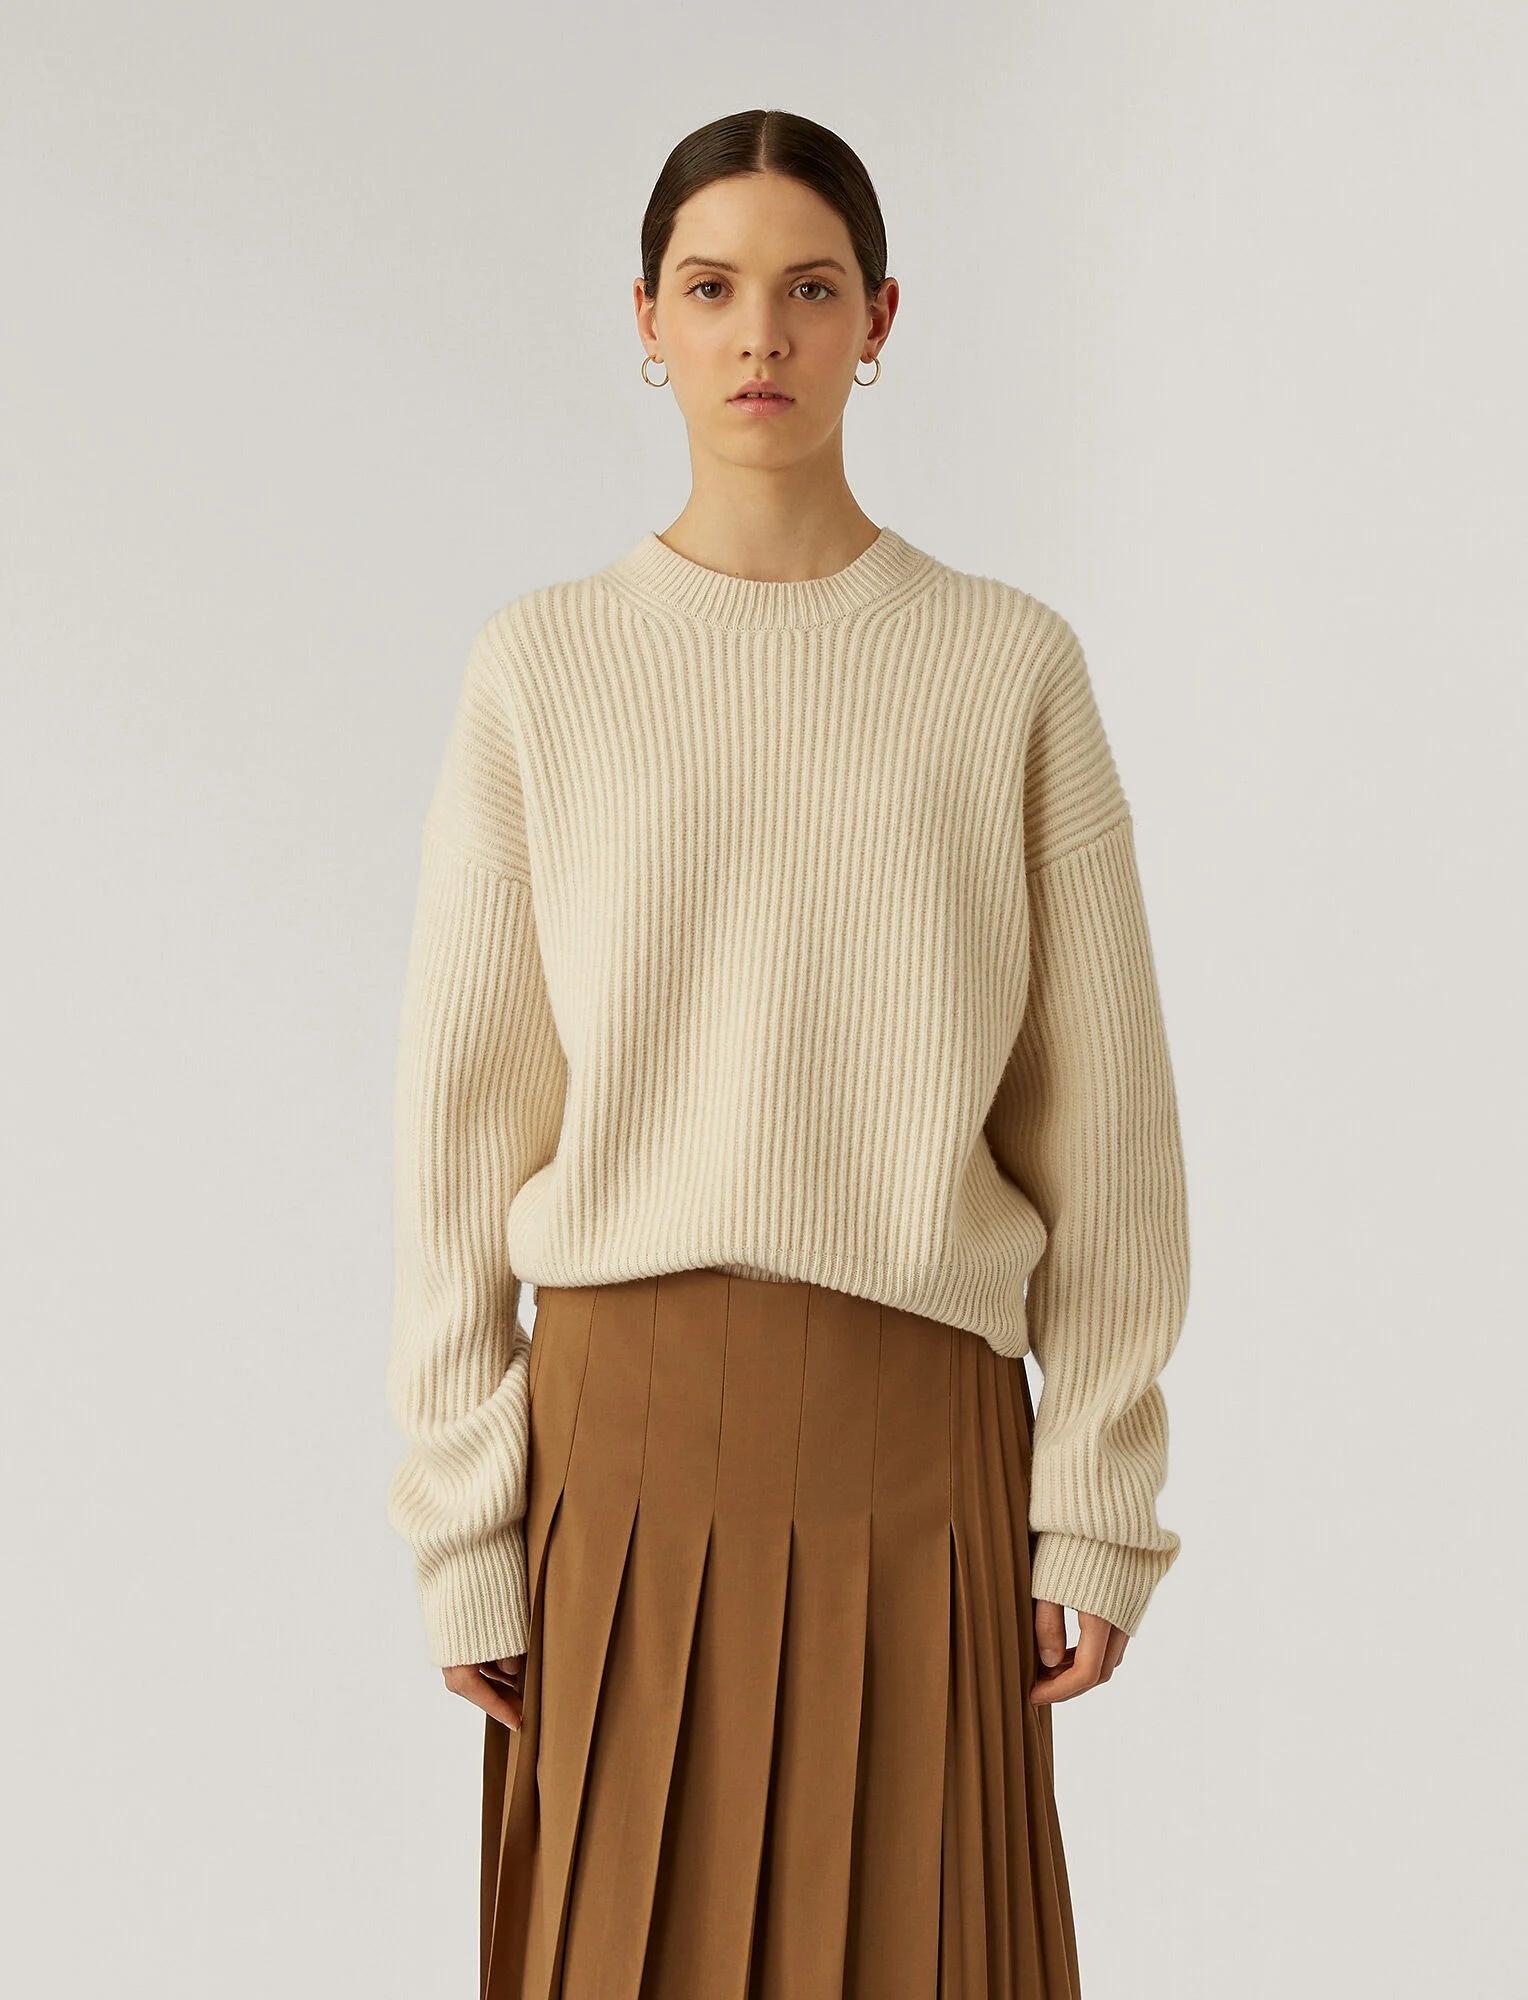 Rd Nk Ls Sweater Cardigan Stitch Ivory